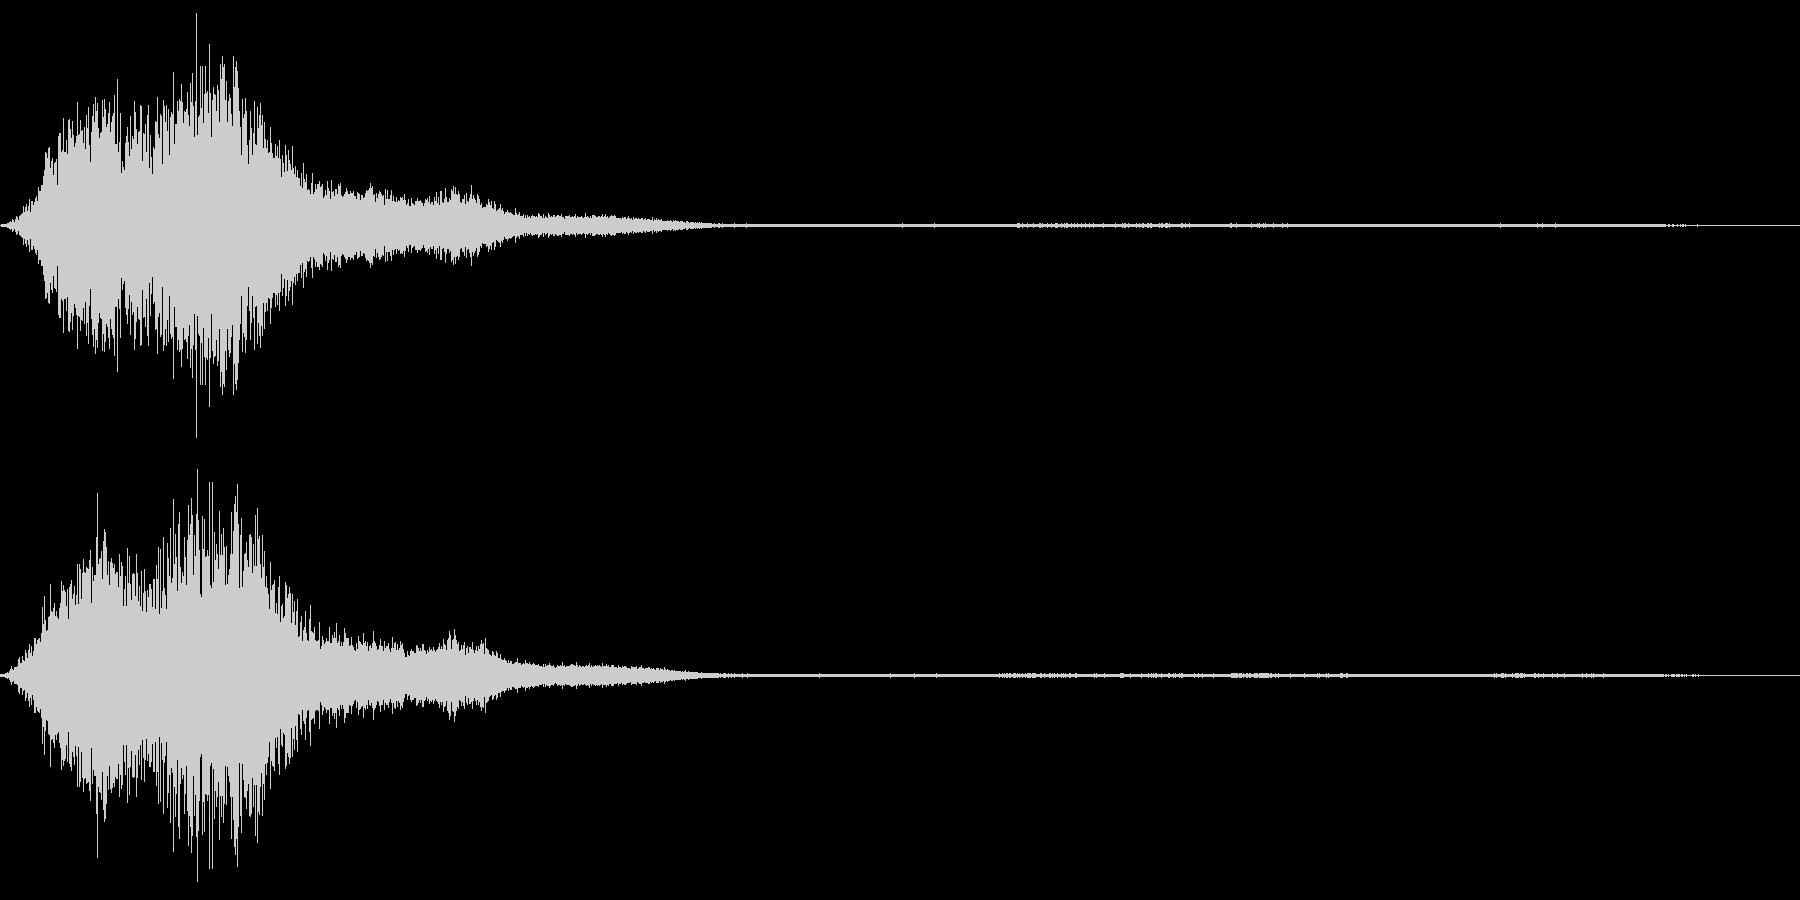 CINEMATIC DARK HELLの未再生の波形